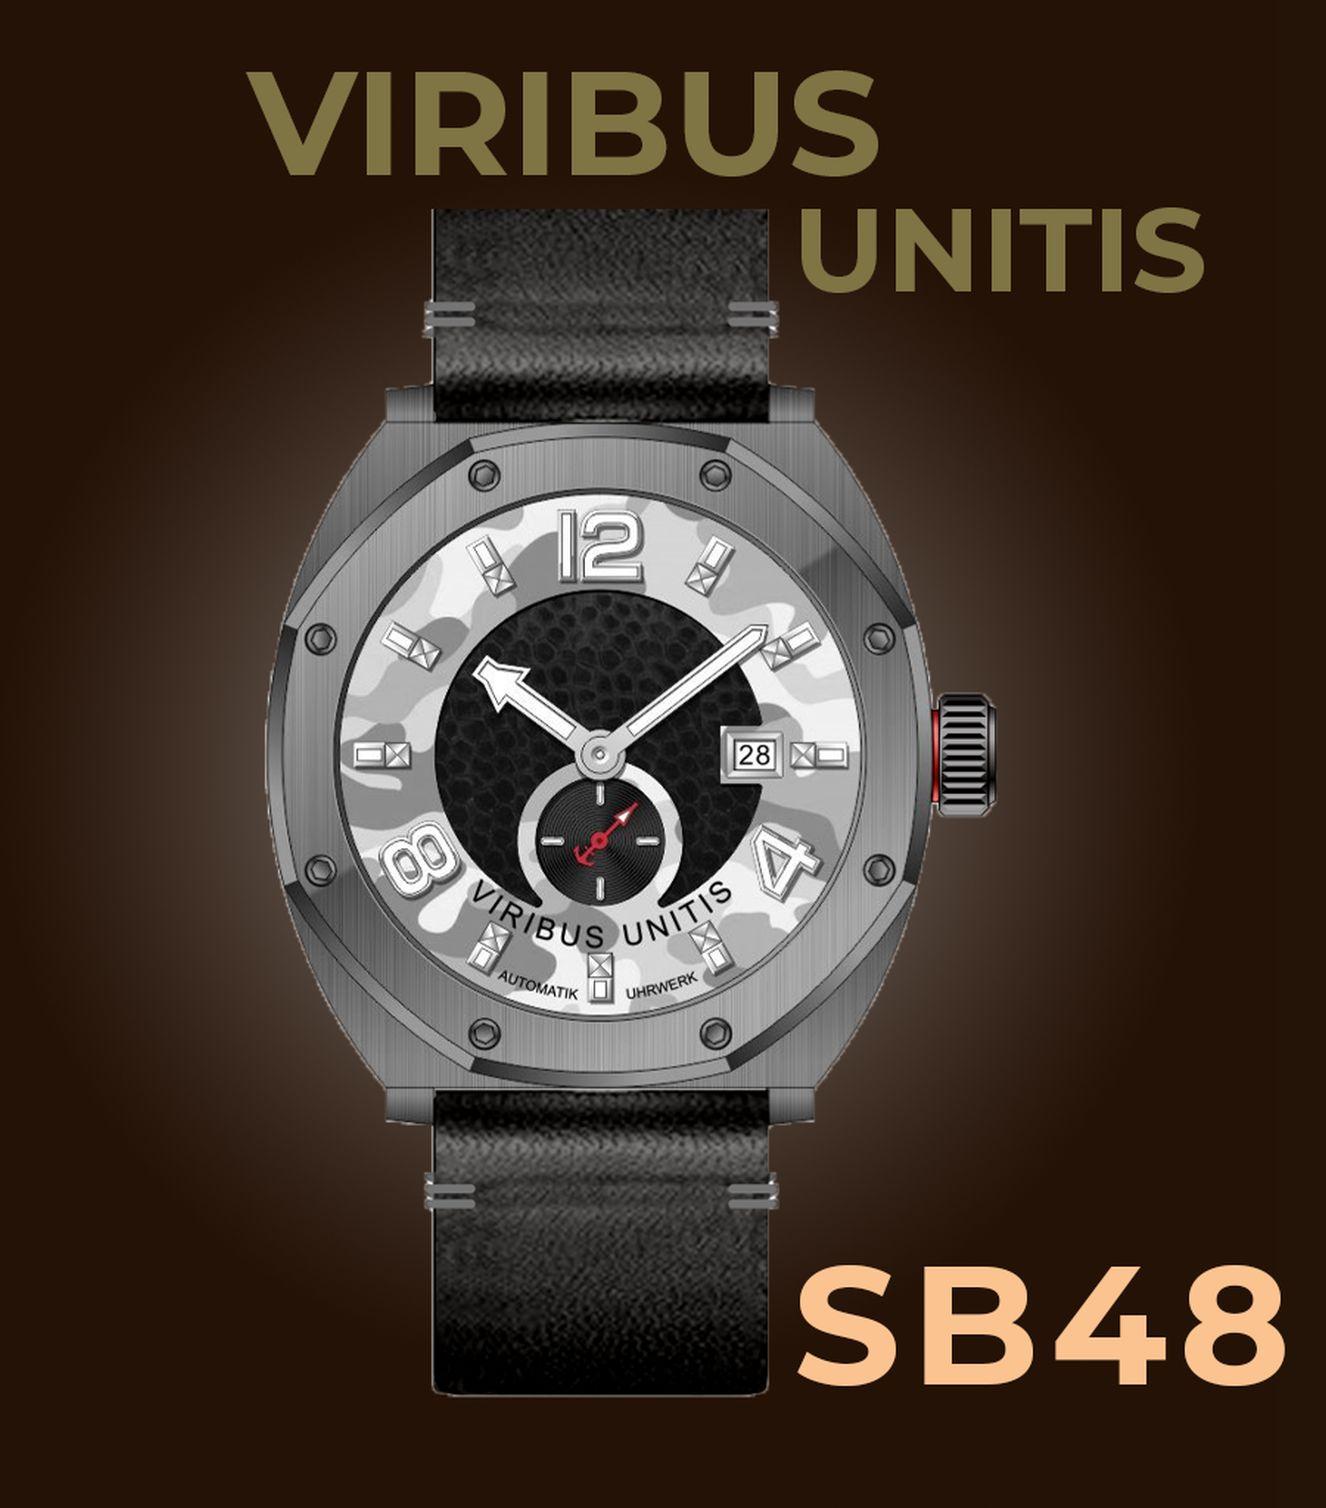 Viribus Unitis Watches